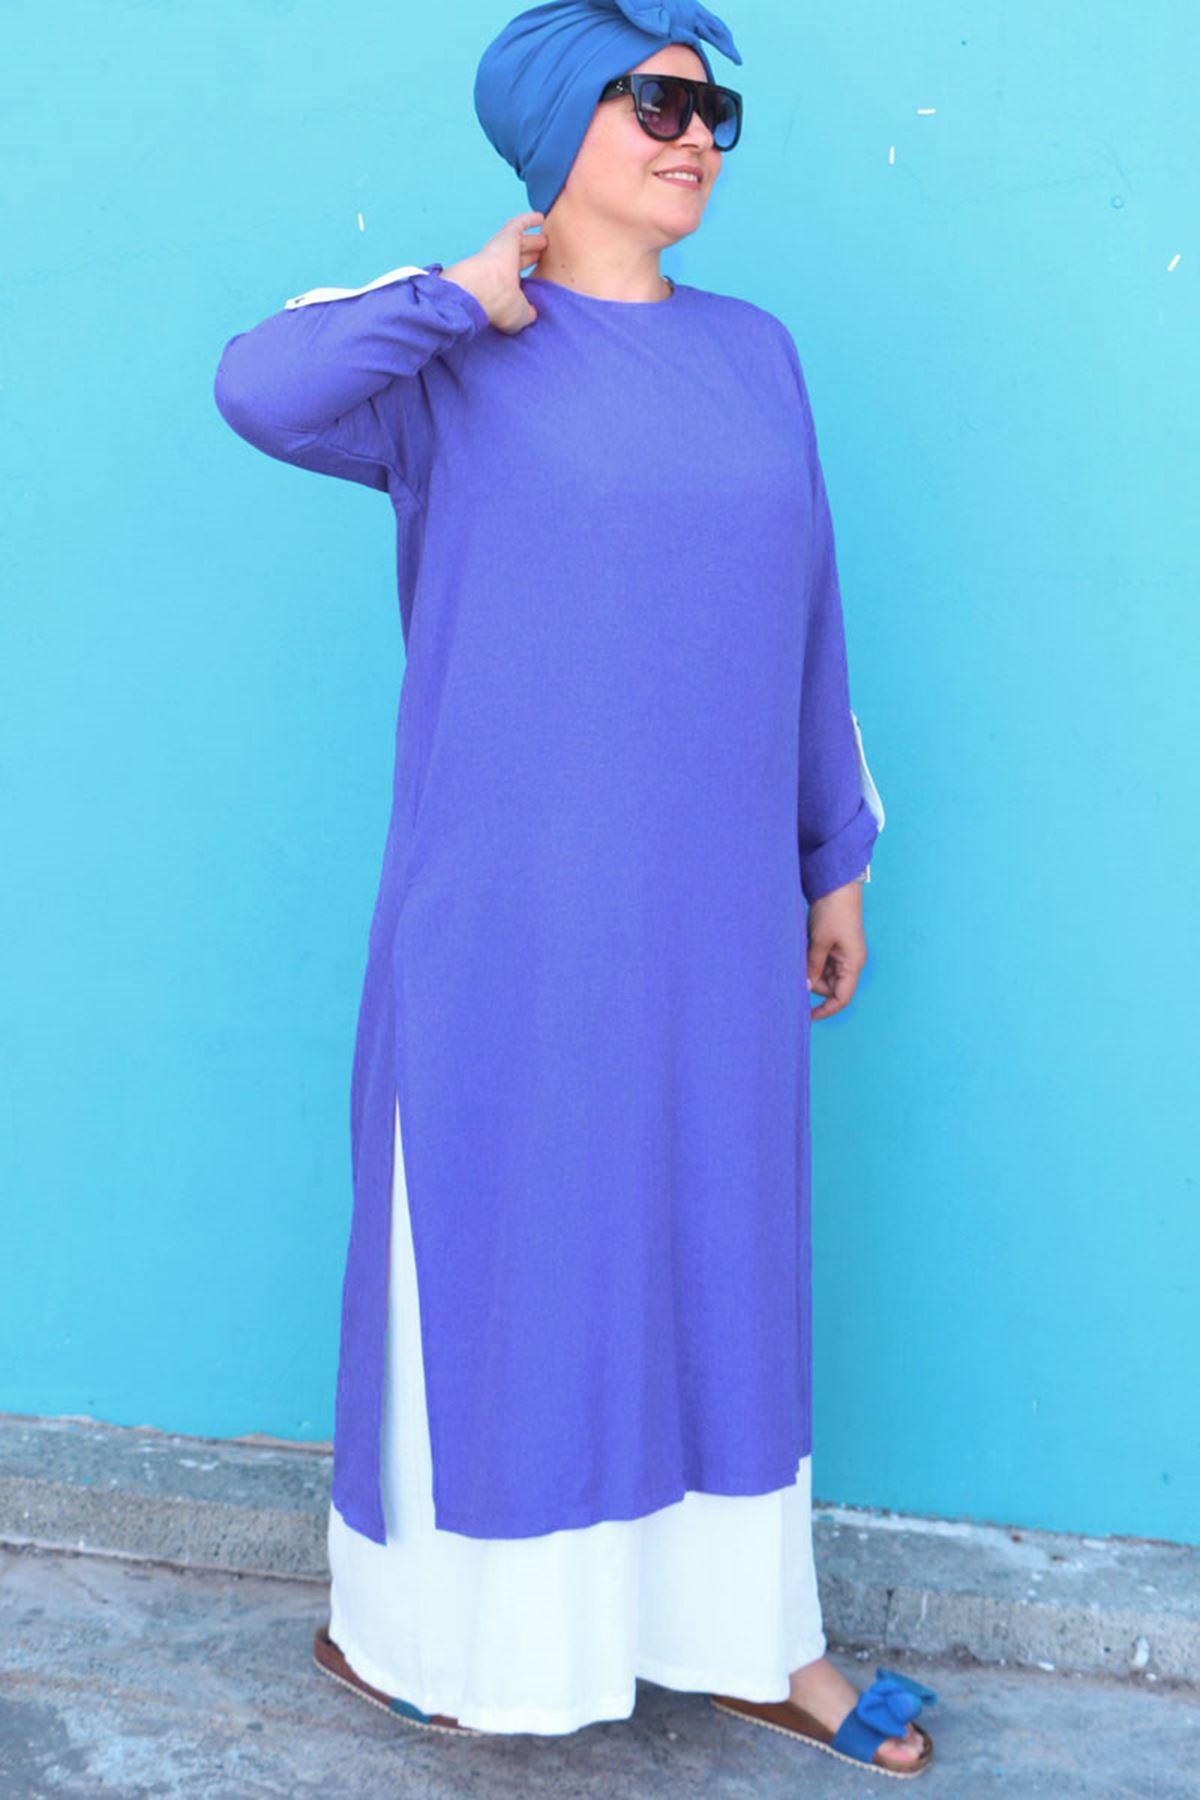 2088 Büyük Beden Mucize Çift Kat Elbise - İndigo